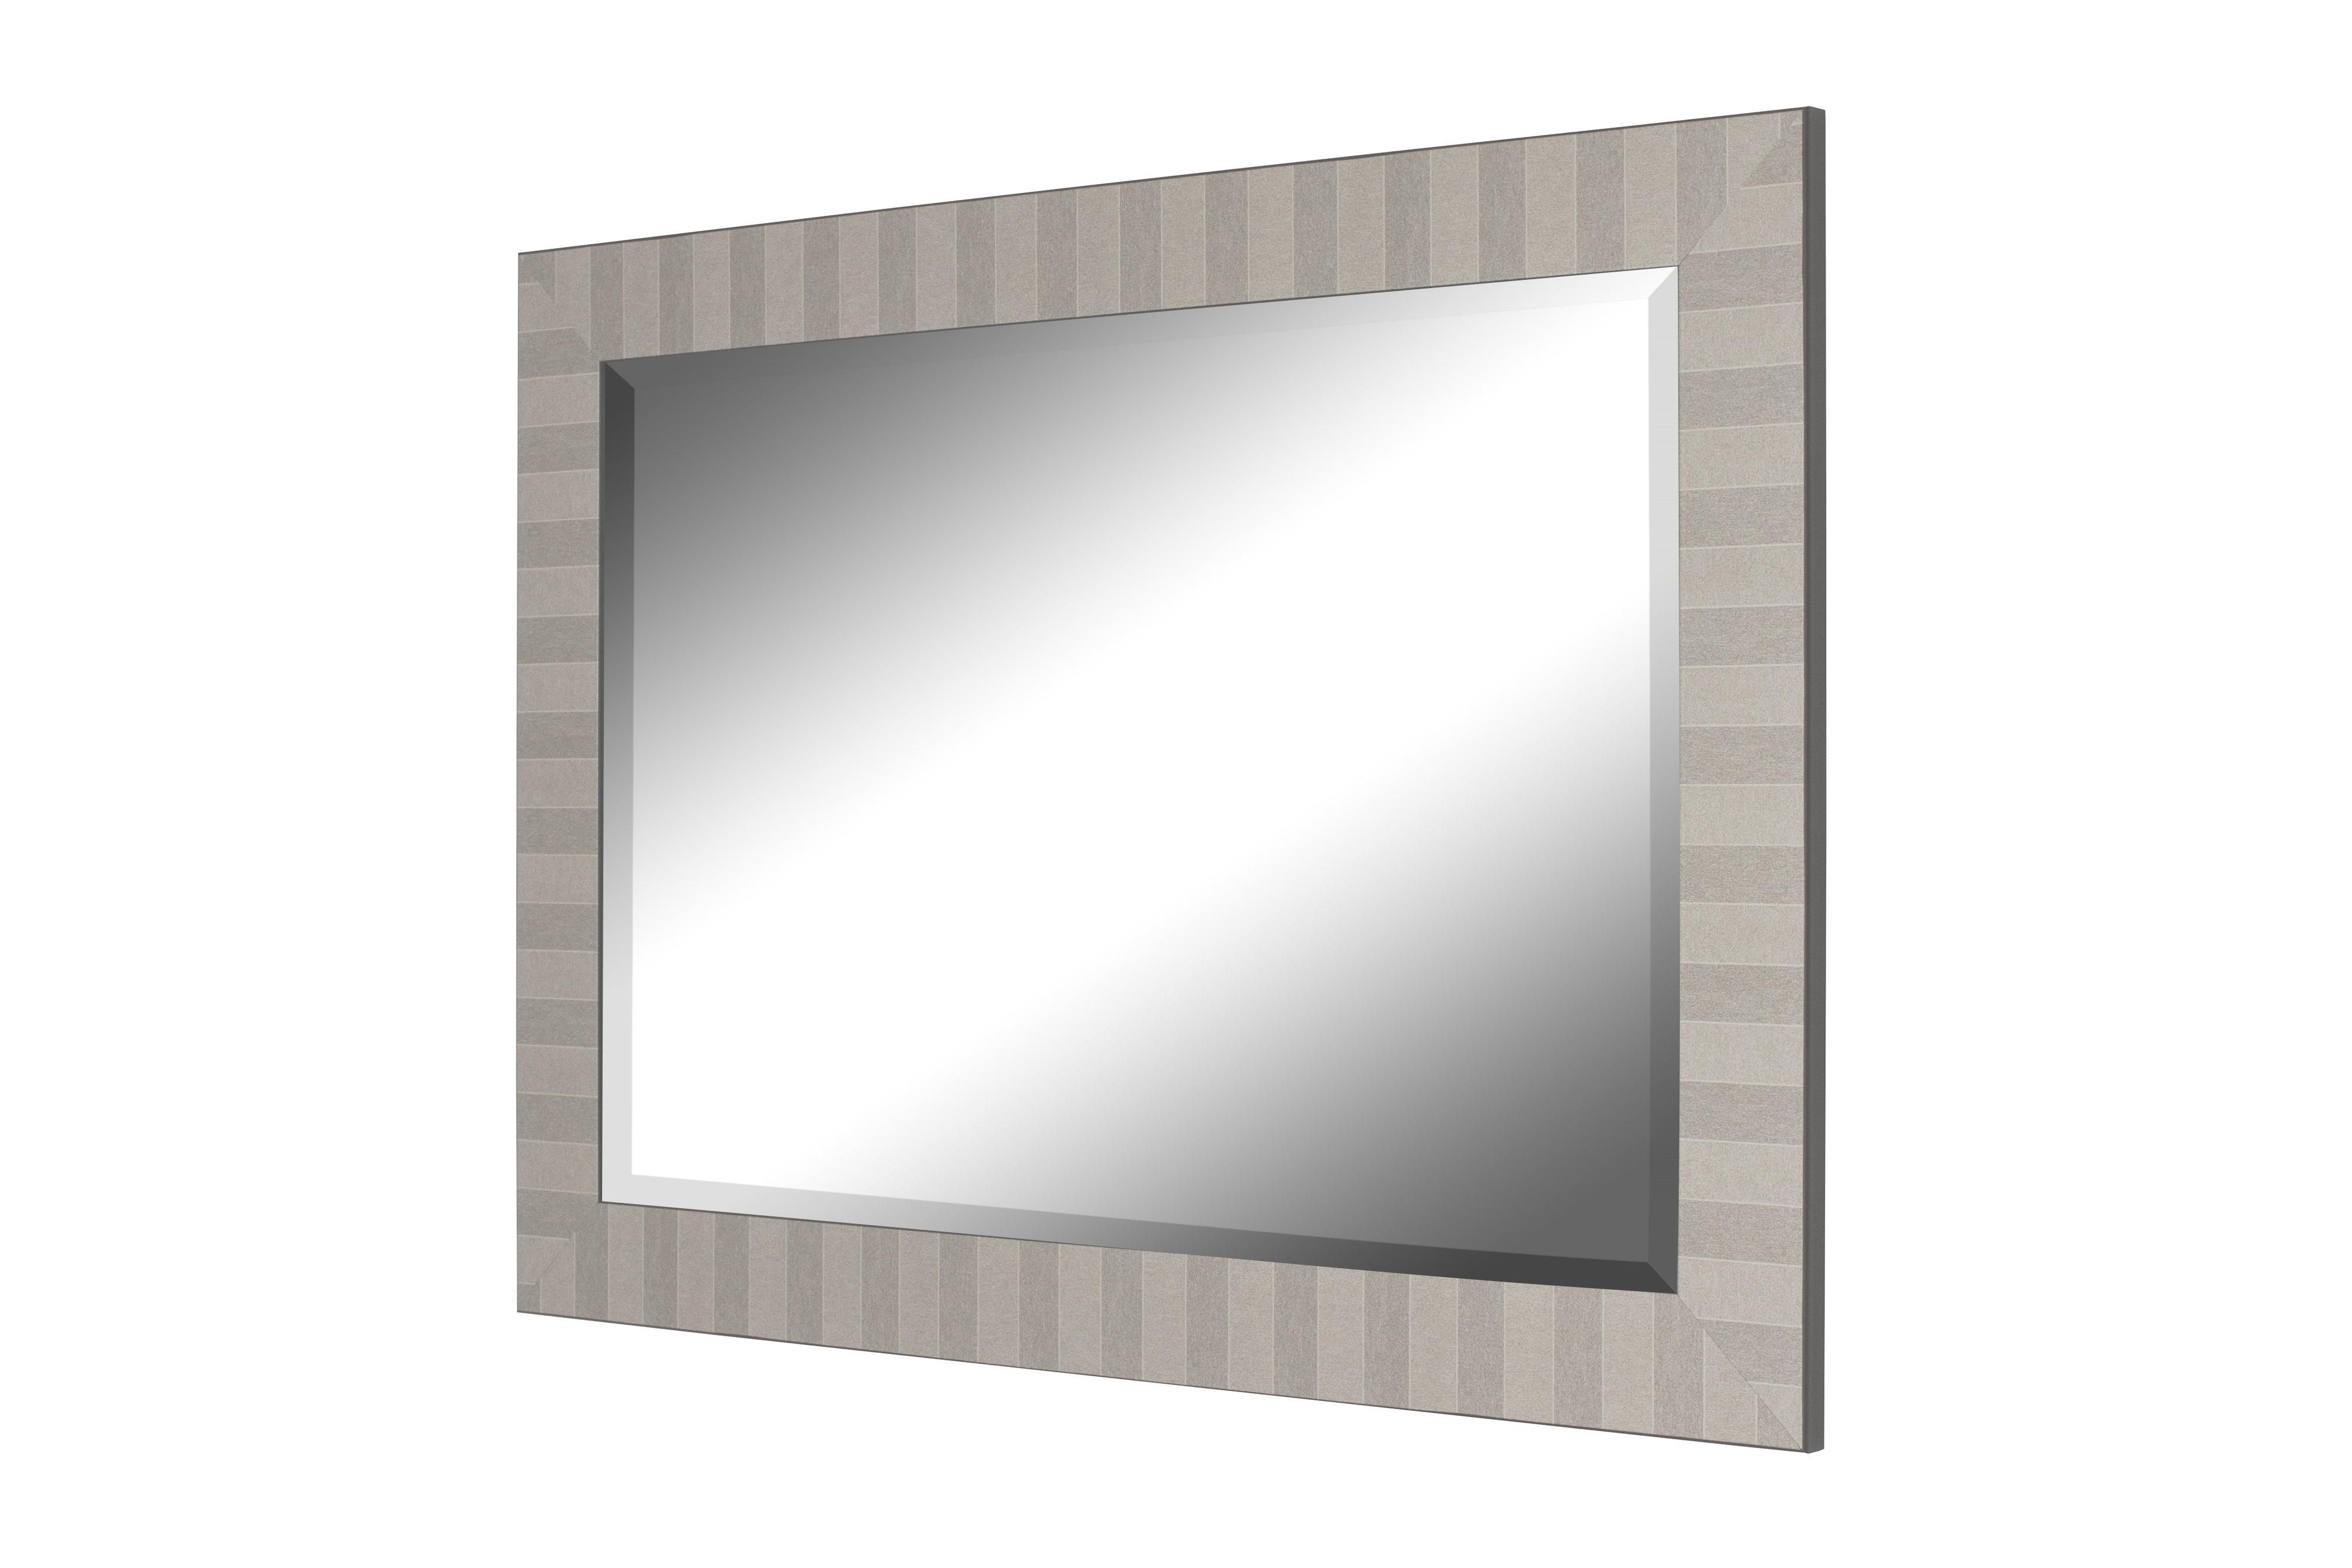 Framed Wall Mirror Regarding Sartain Modern & Contemporary Wall Mirrors (View 6 of 20)